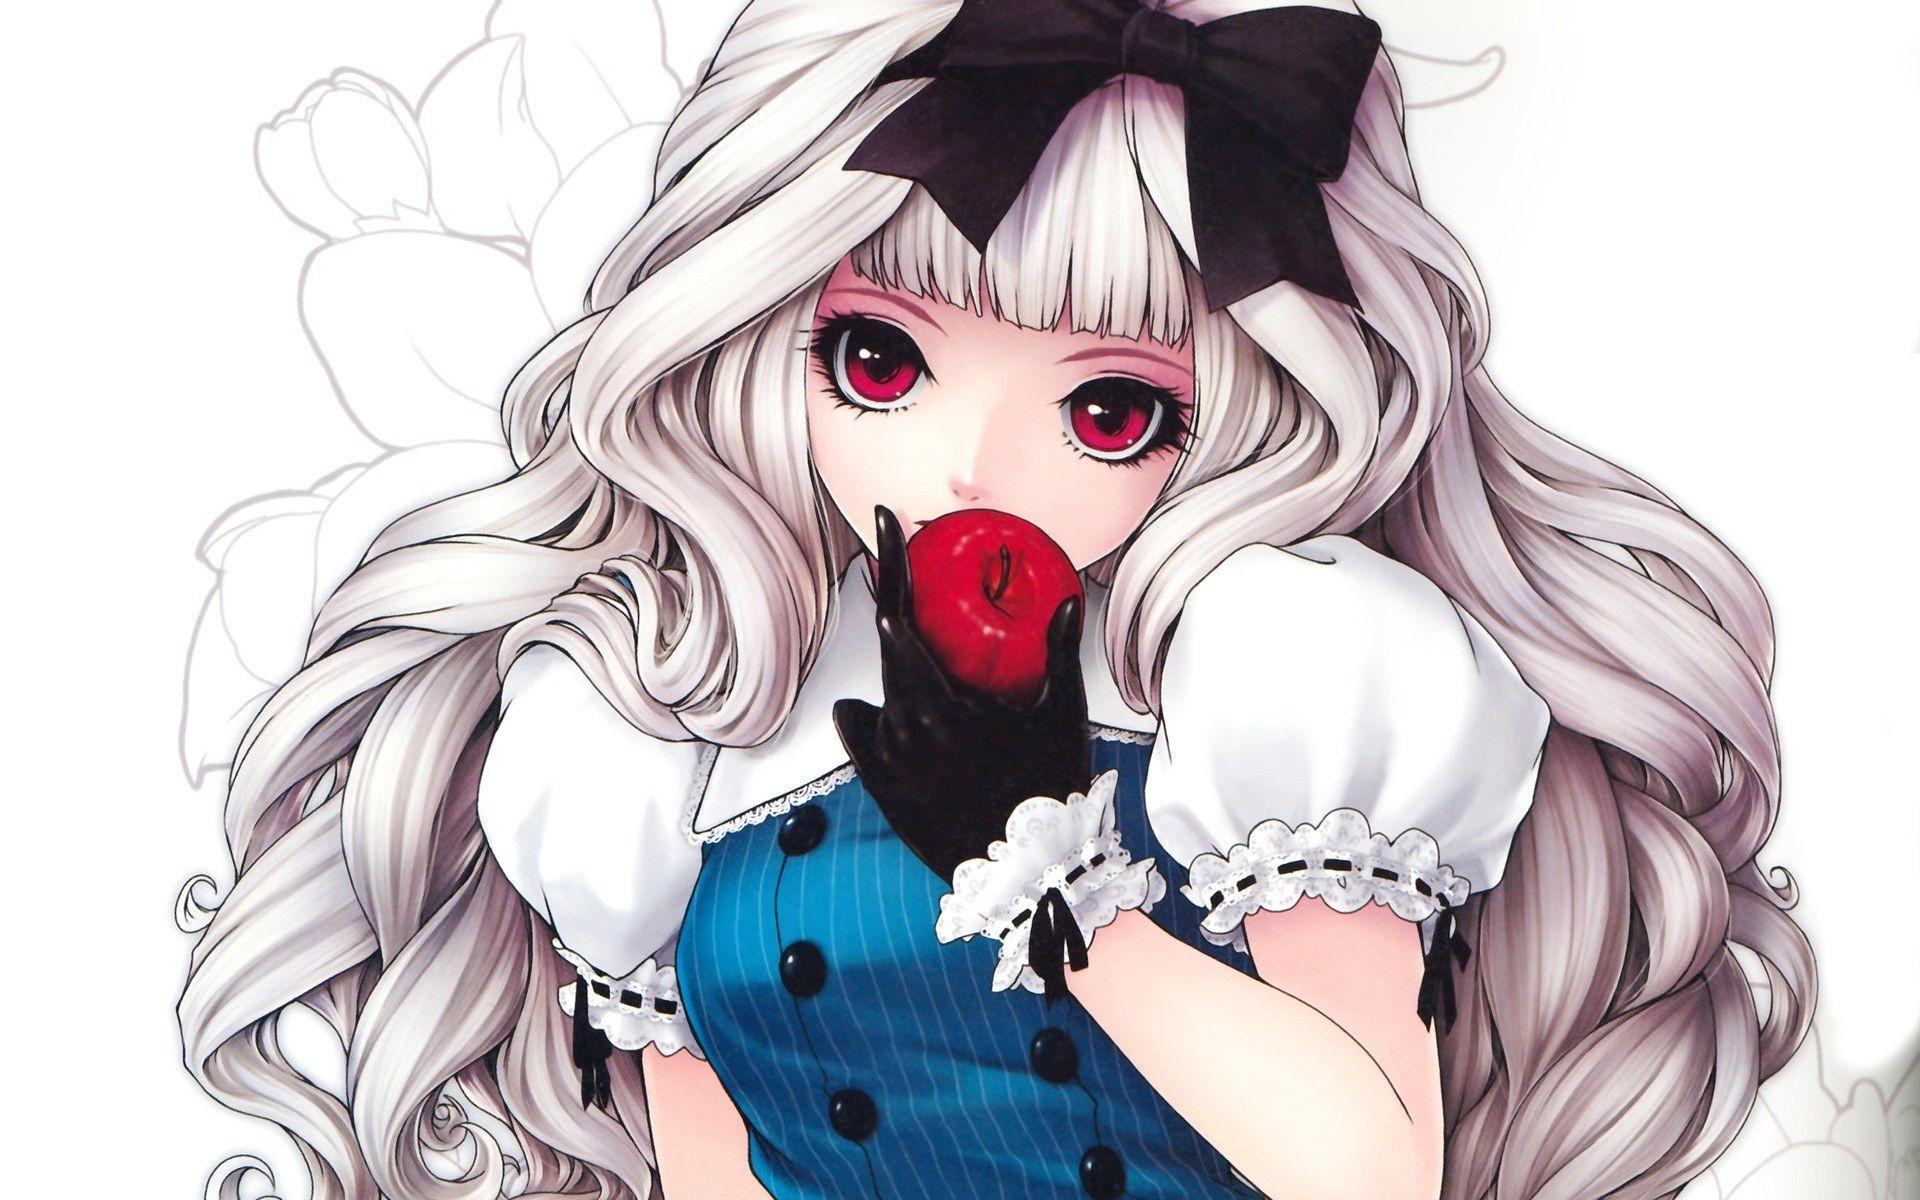 Anime vampire girl with blonde hair